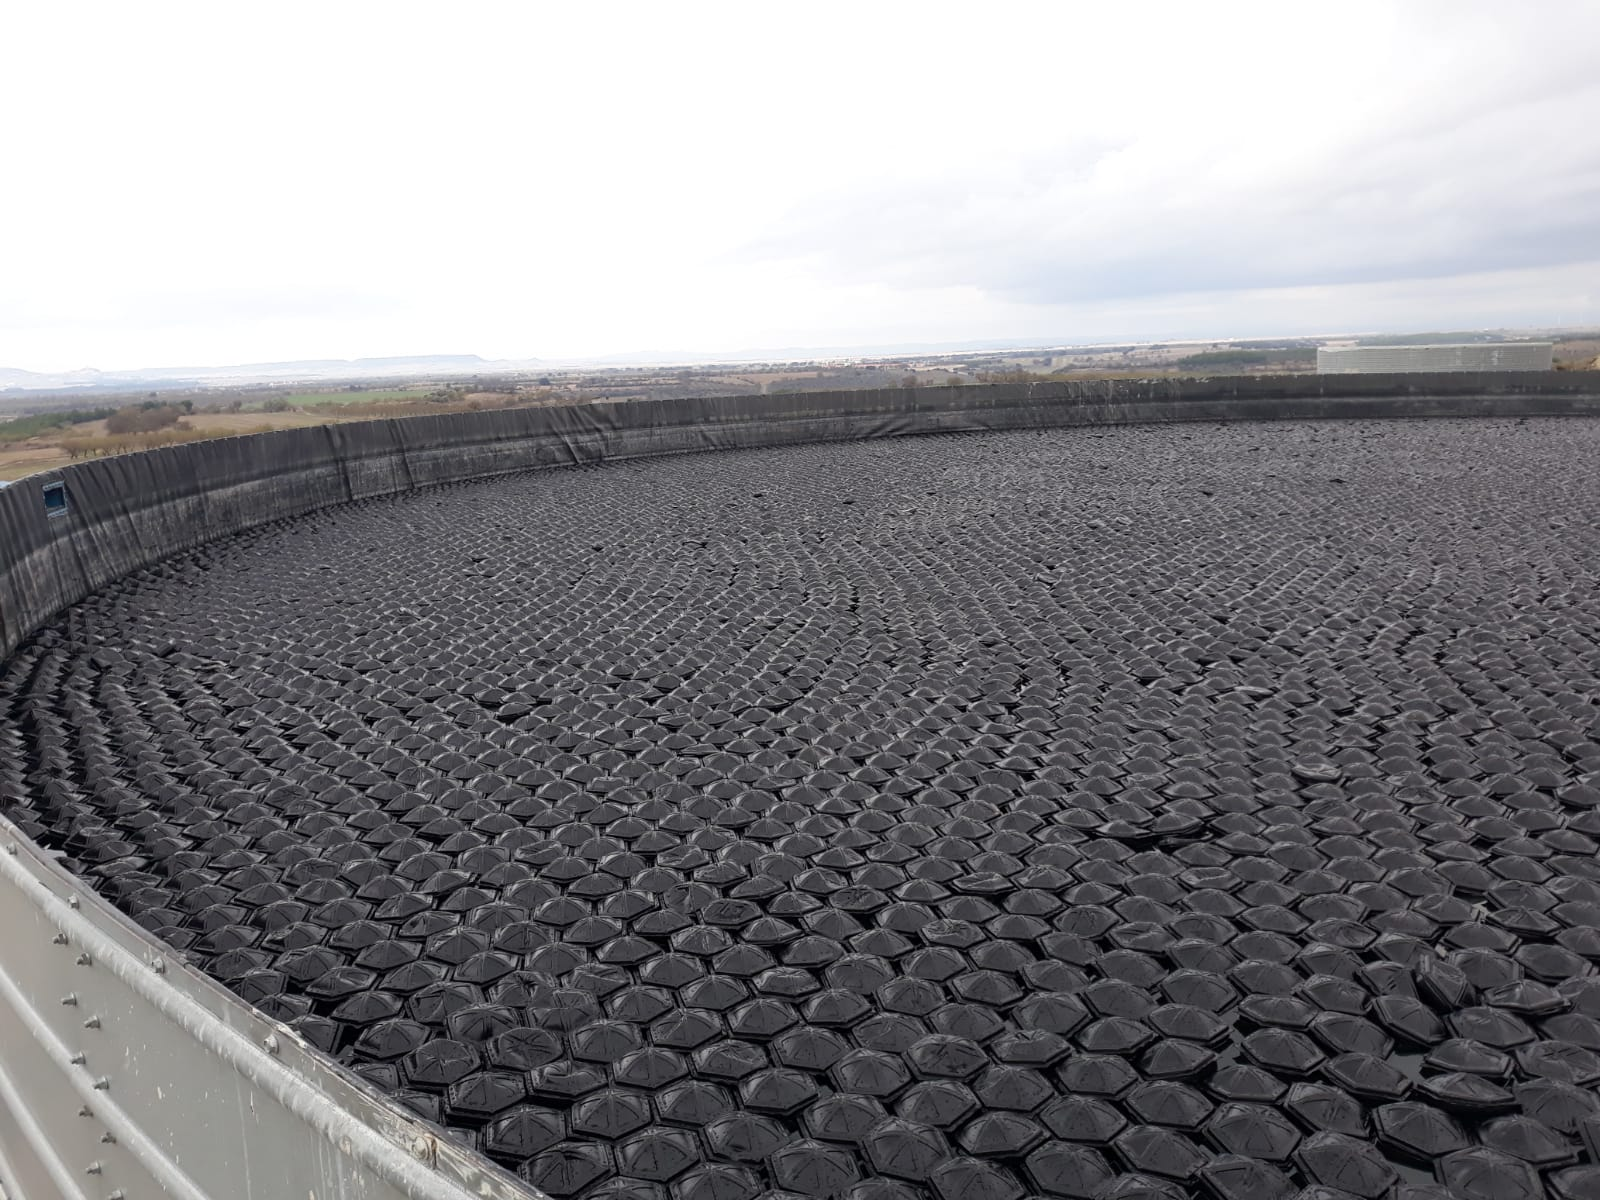 eliminación de algas en balsa de riego circular